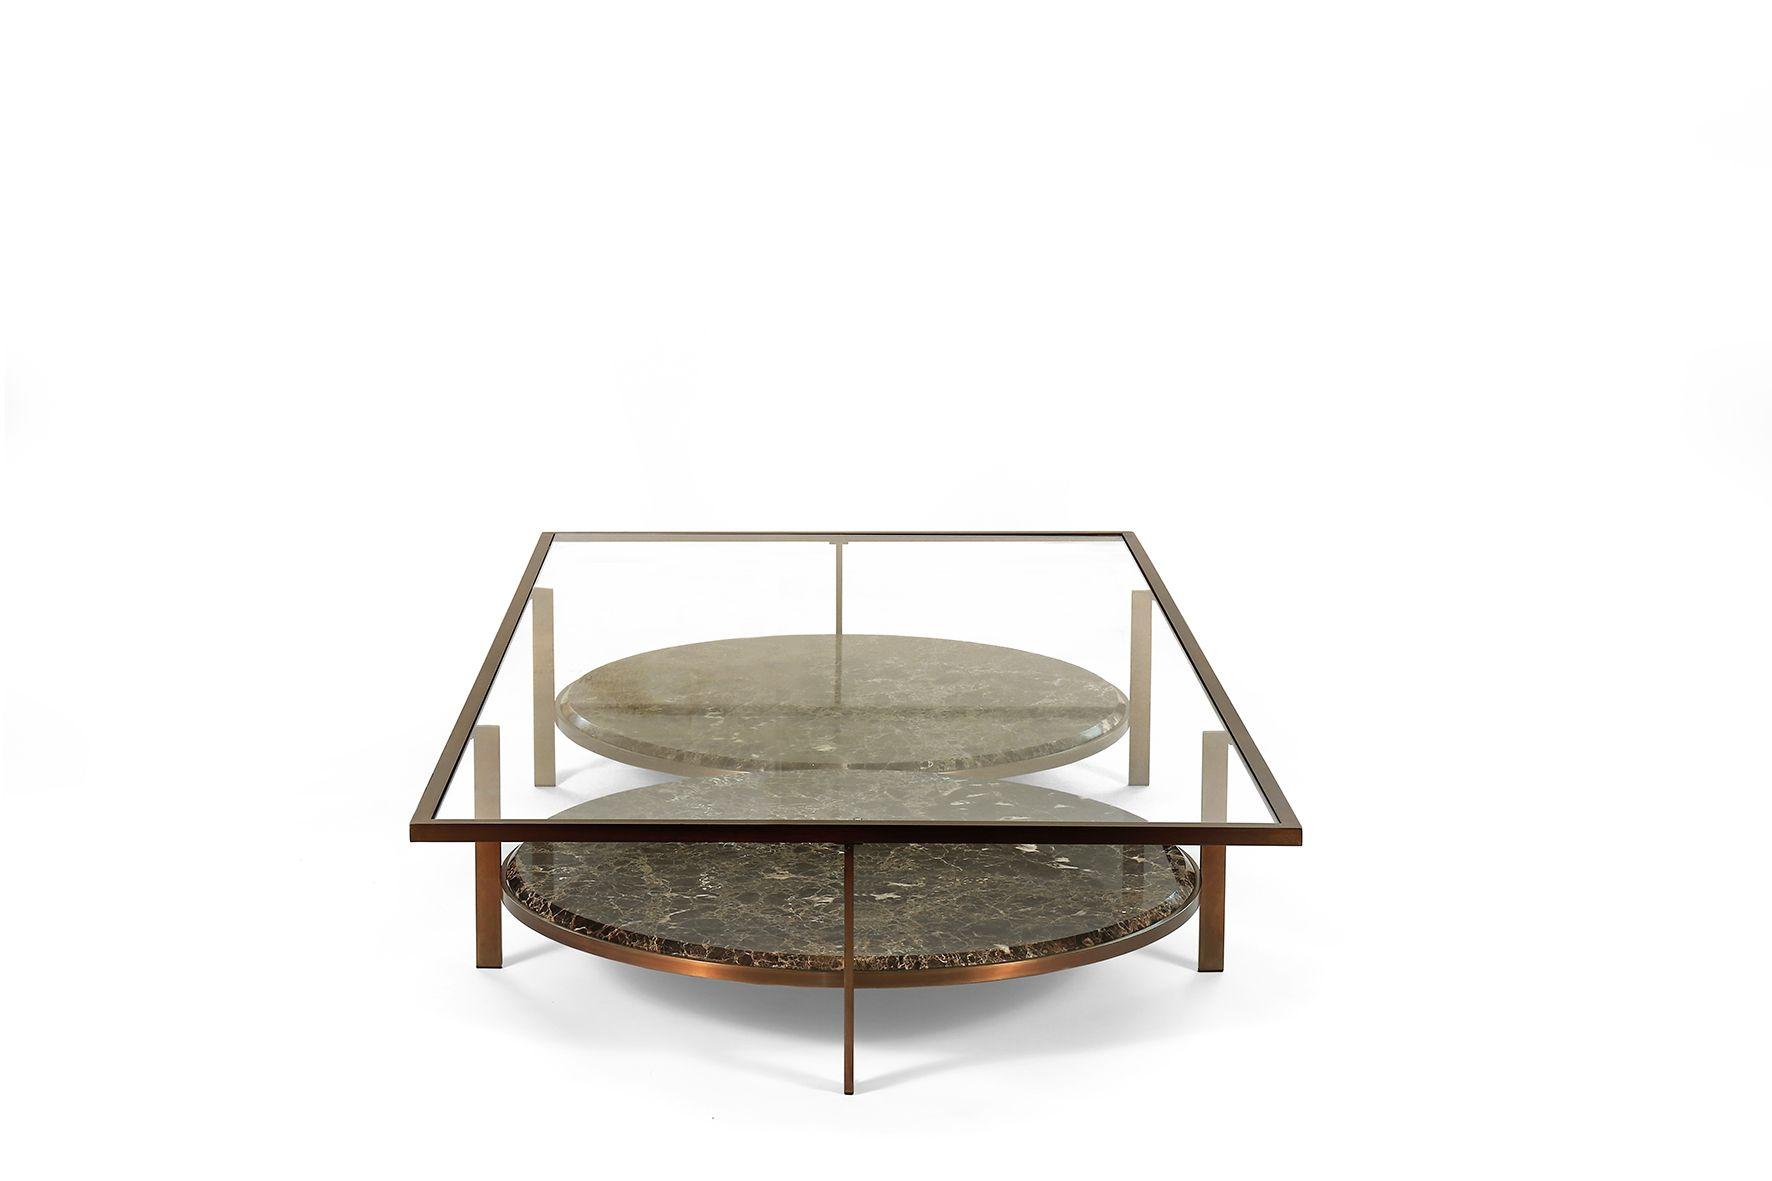 Paul 3 Coffee Tables By Borzalino Metal Frame Crystal Glass Upper Top Marble Lower Top Coffee Table Furniture Sofa 3 Coffee Tables Coffee Table Table [ 1181 x 1772 Pixel ]